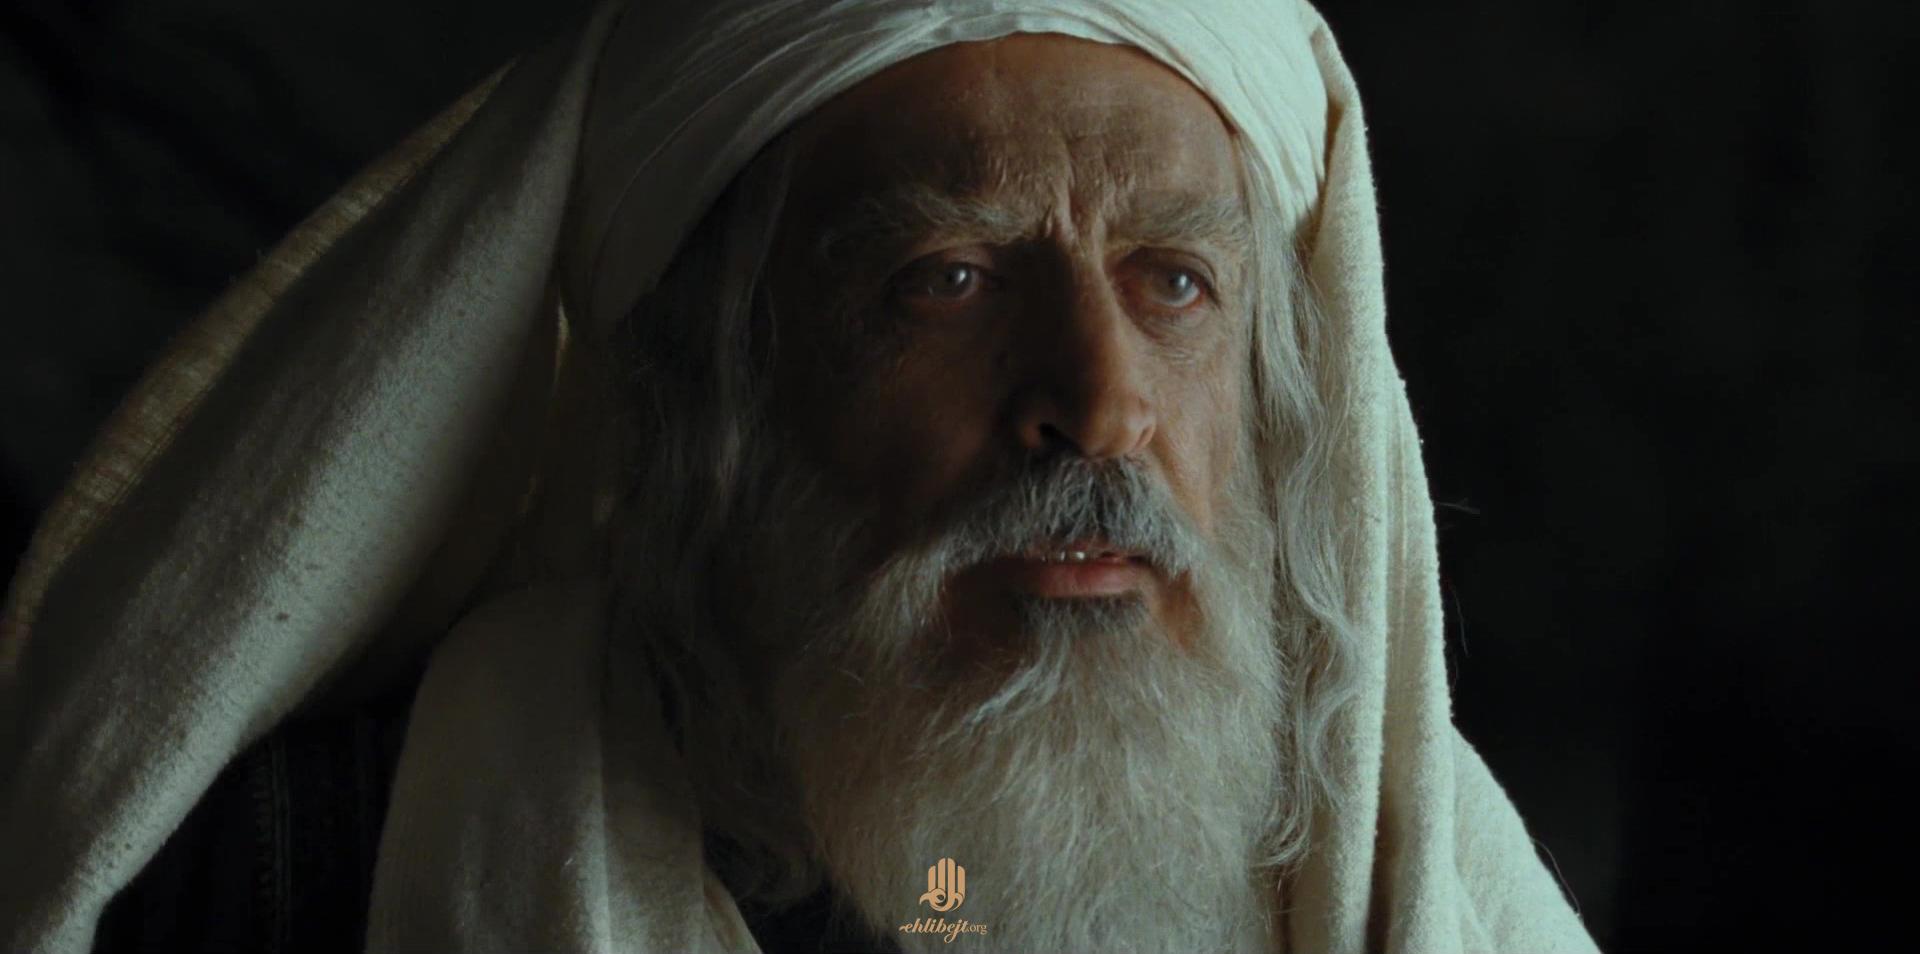 Abdulmuttalib poglavar Kurejša